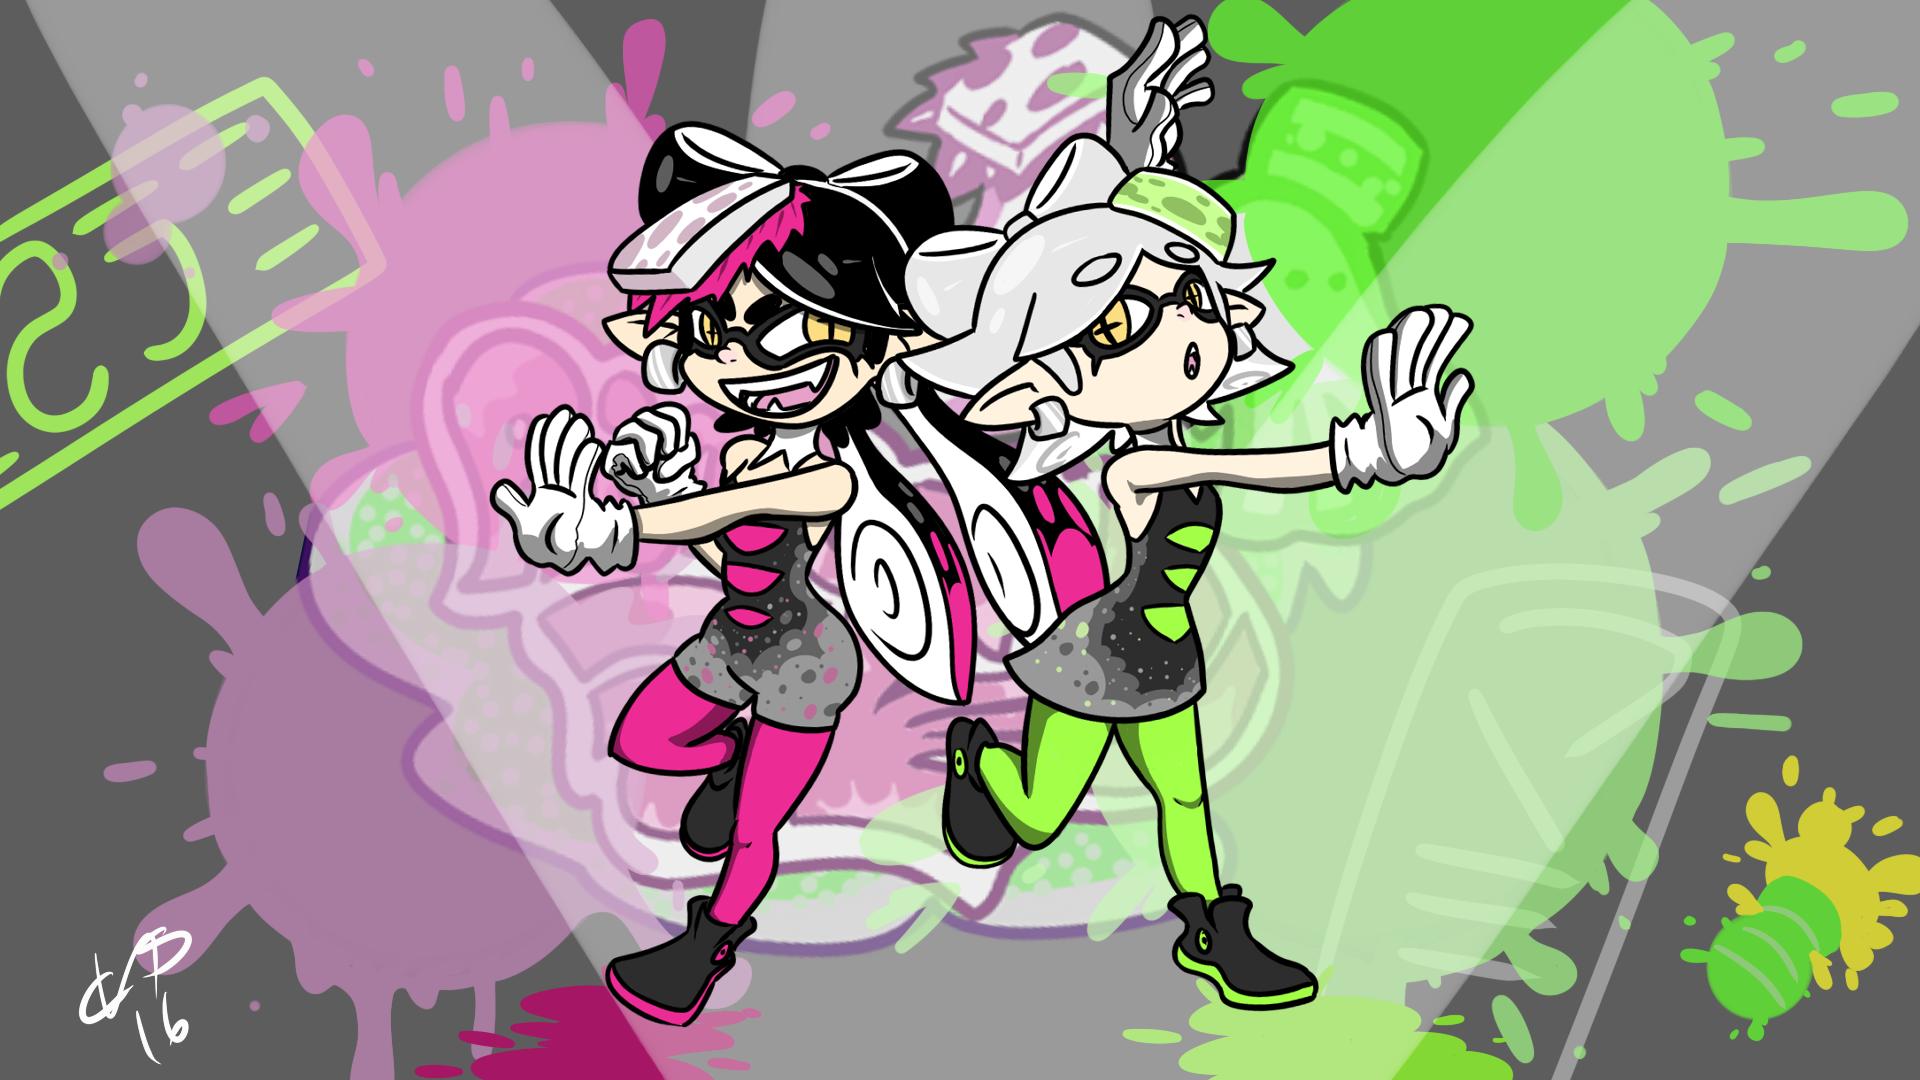 Squid sister!